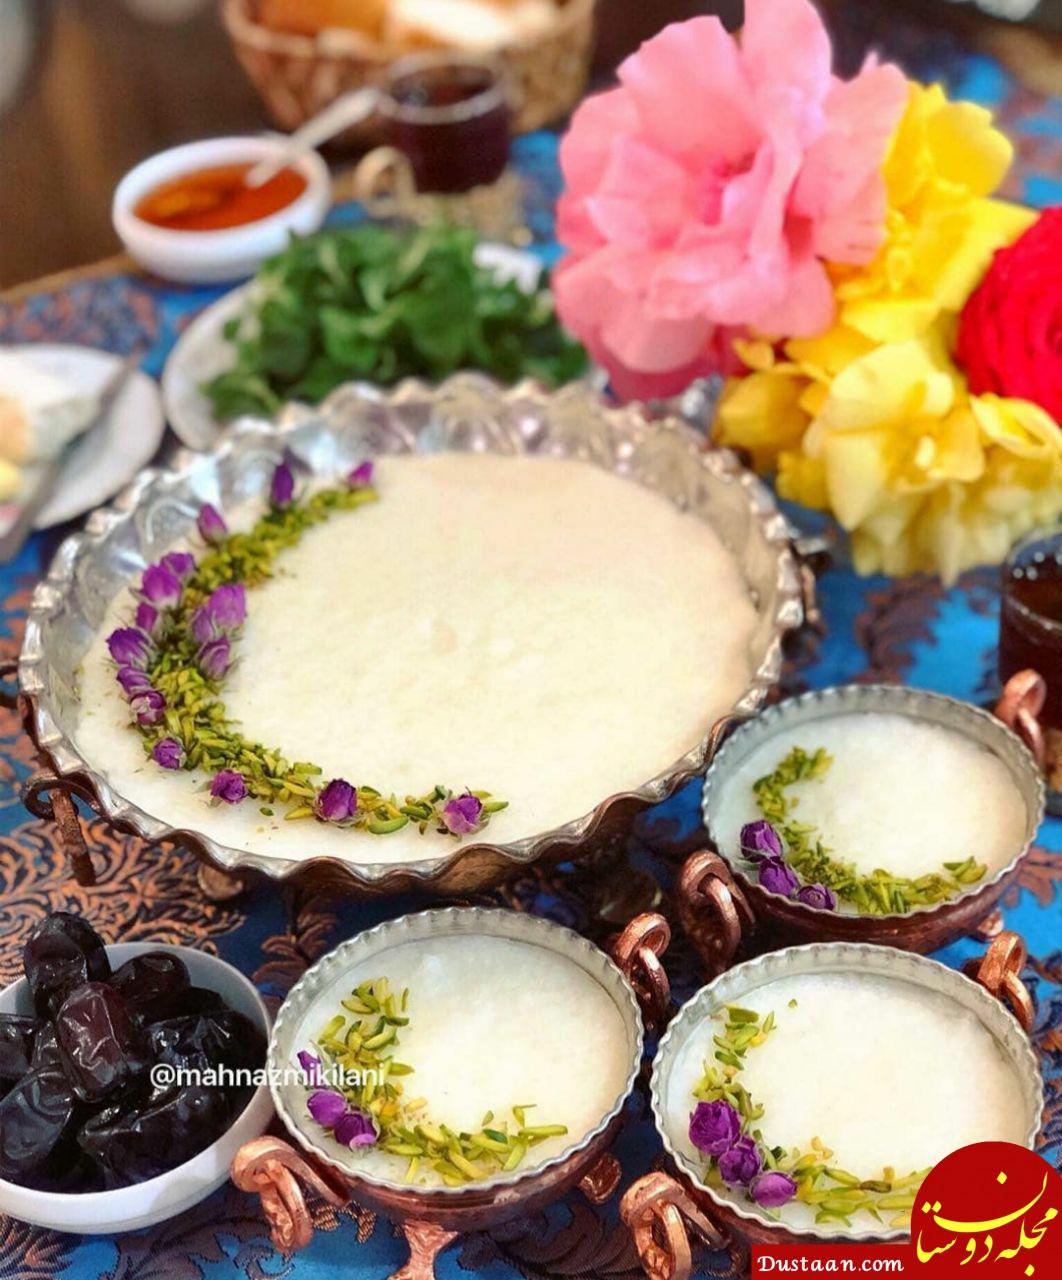 www.dustaan.com طرز تهیه شیر برنج مخصوص ماه رمضان ، خوشمزه و متفاوت